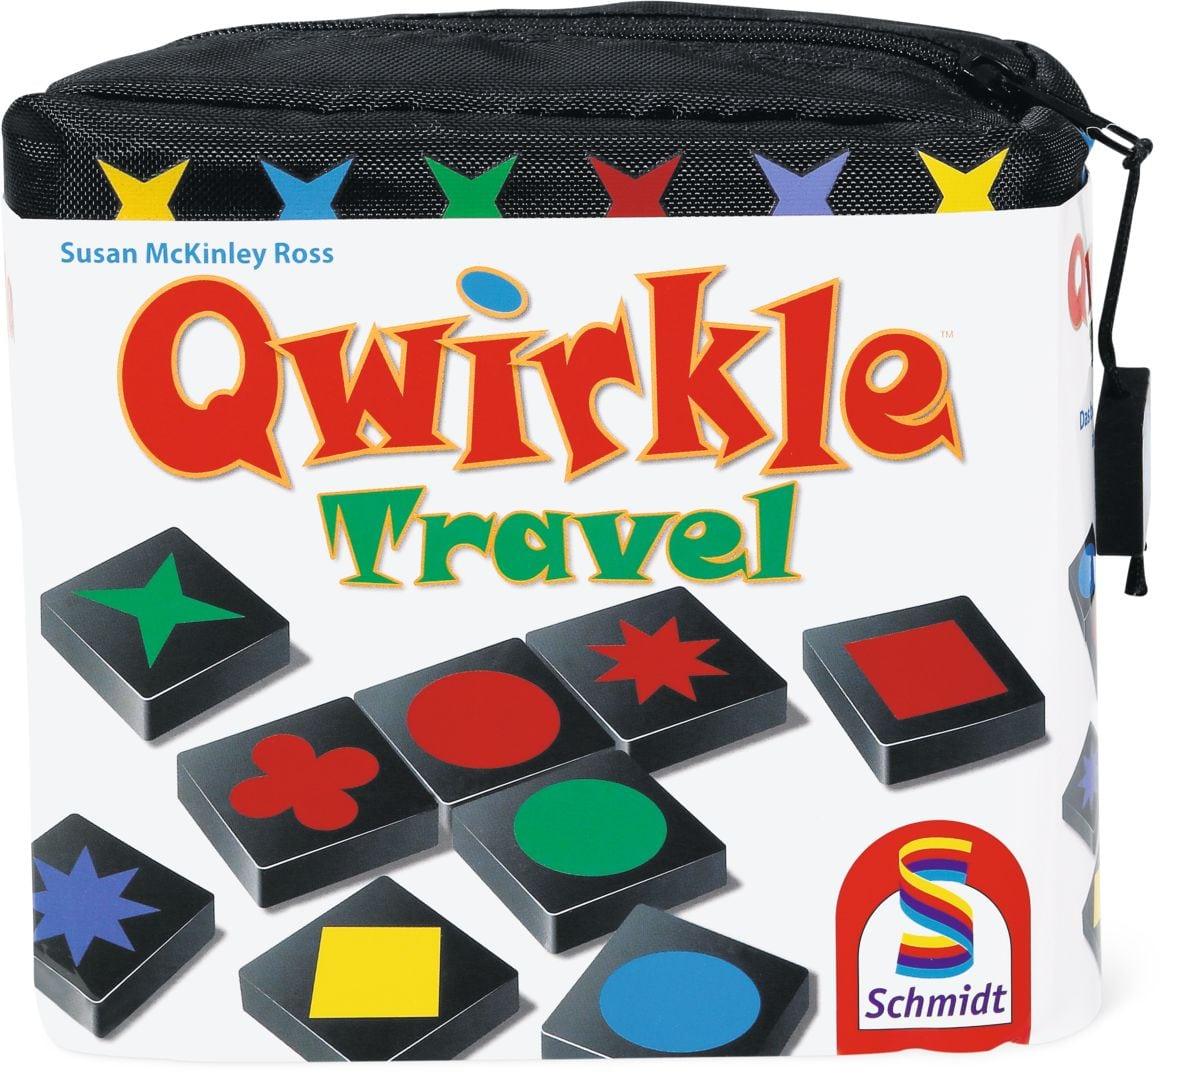 Schmidt Qwirkle Travel Gesellschaftsspiel